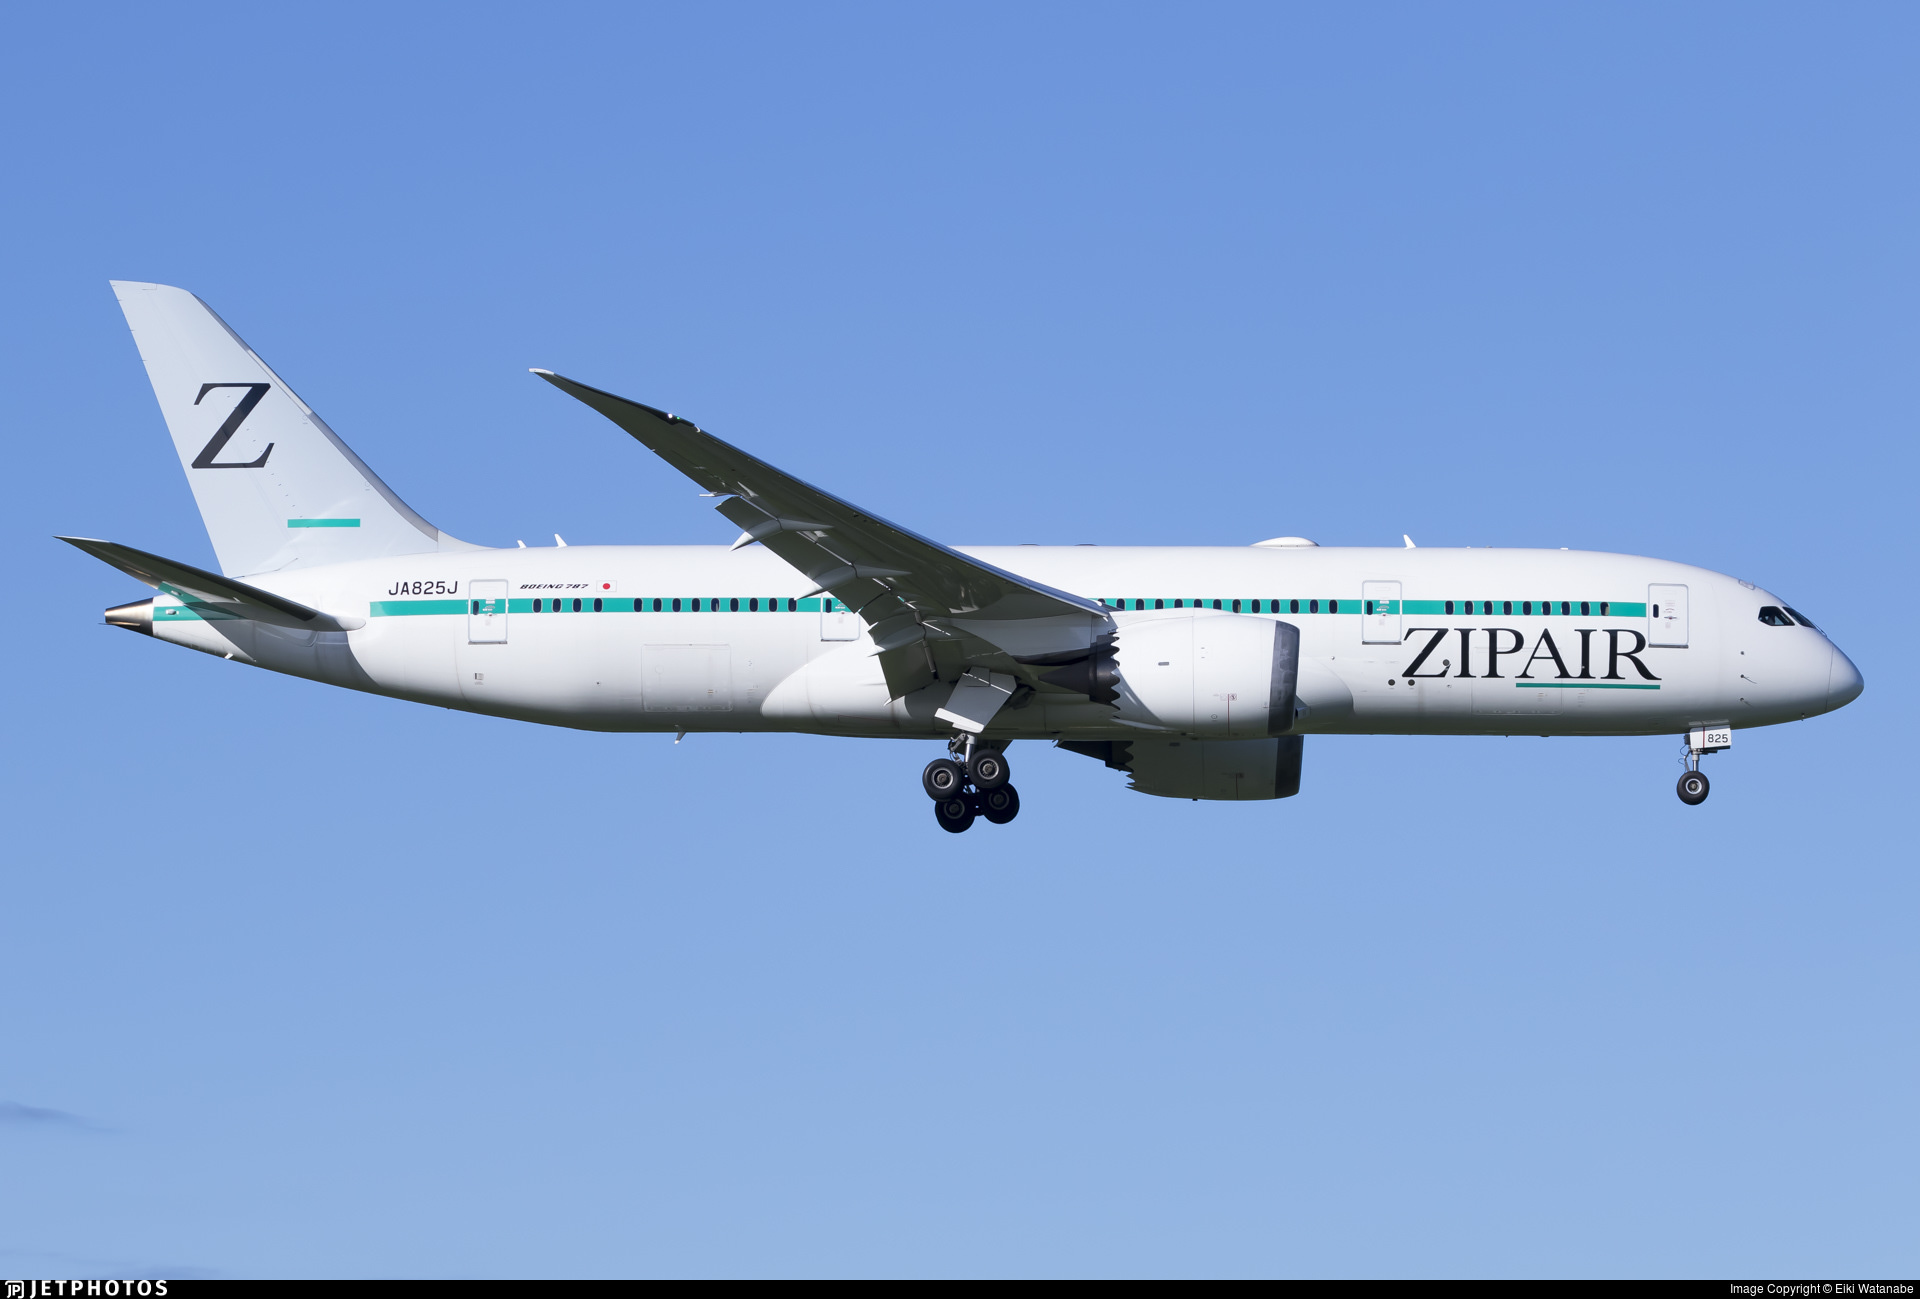 ZipAir 787